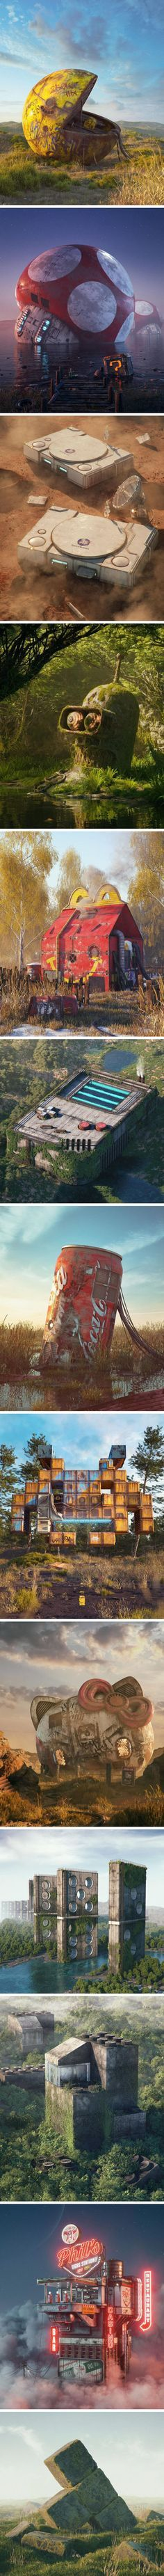 Pop Culture Apocalypse In Amazing Digital Art By Filip Hodas ^^^i love this